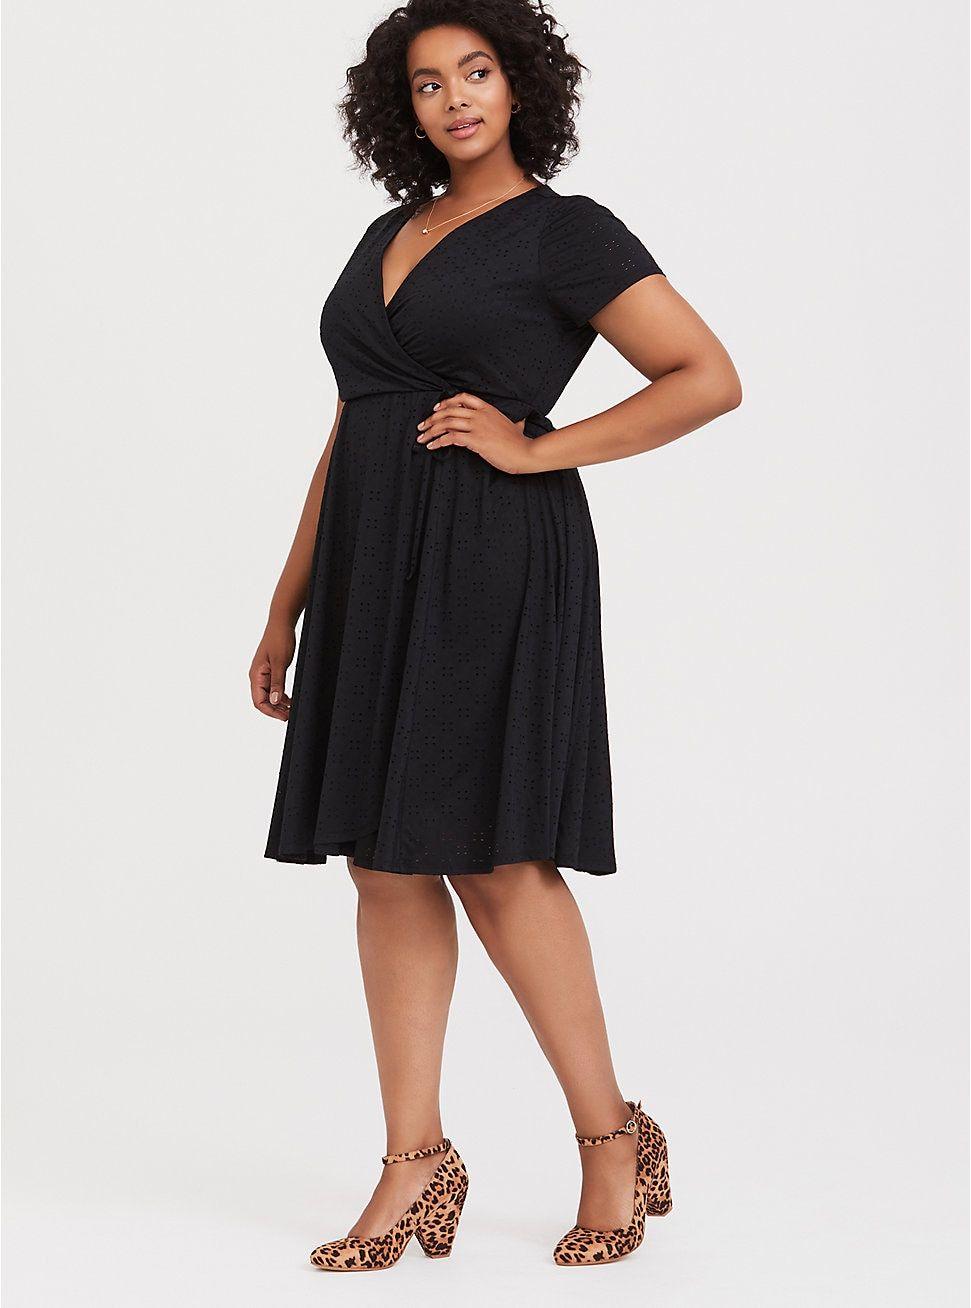 Black jersey eyelet wrap dress dresses jersey knit midi